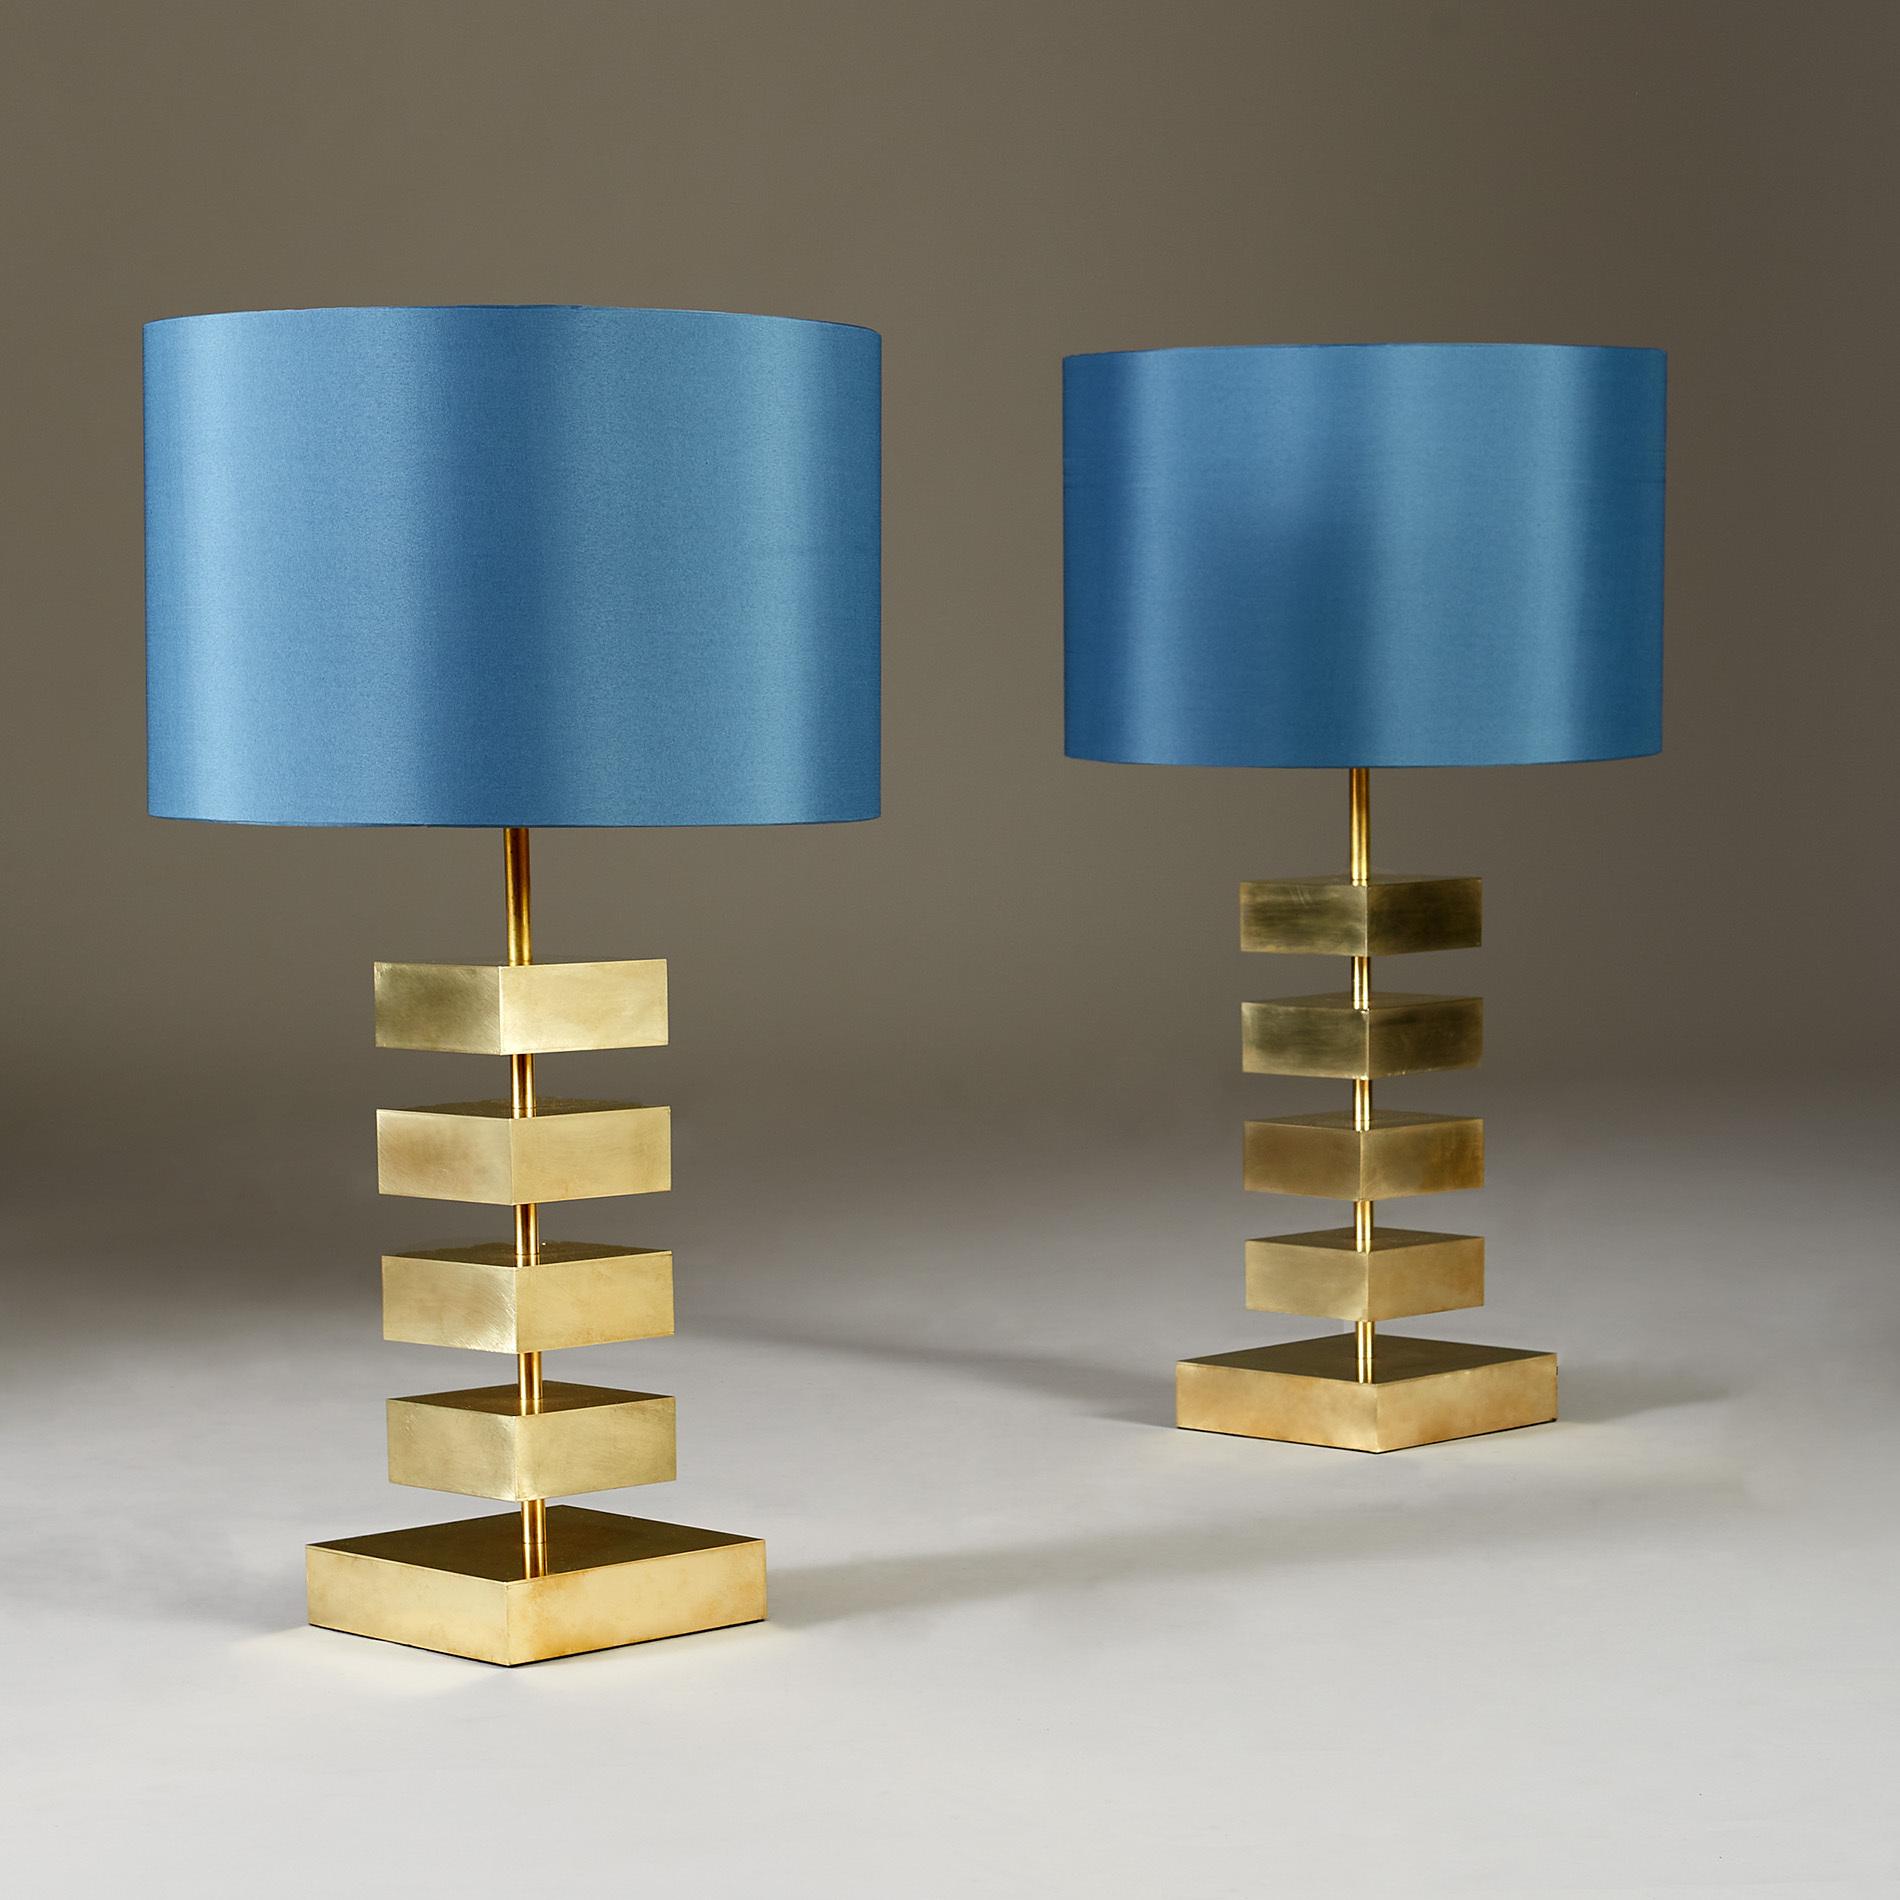 Luigi Stacked Table Lamps 20210225 Valerie Wade 2 197 V1